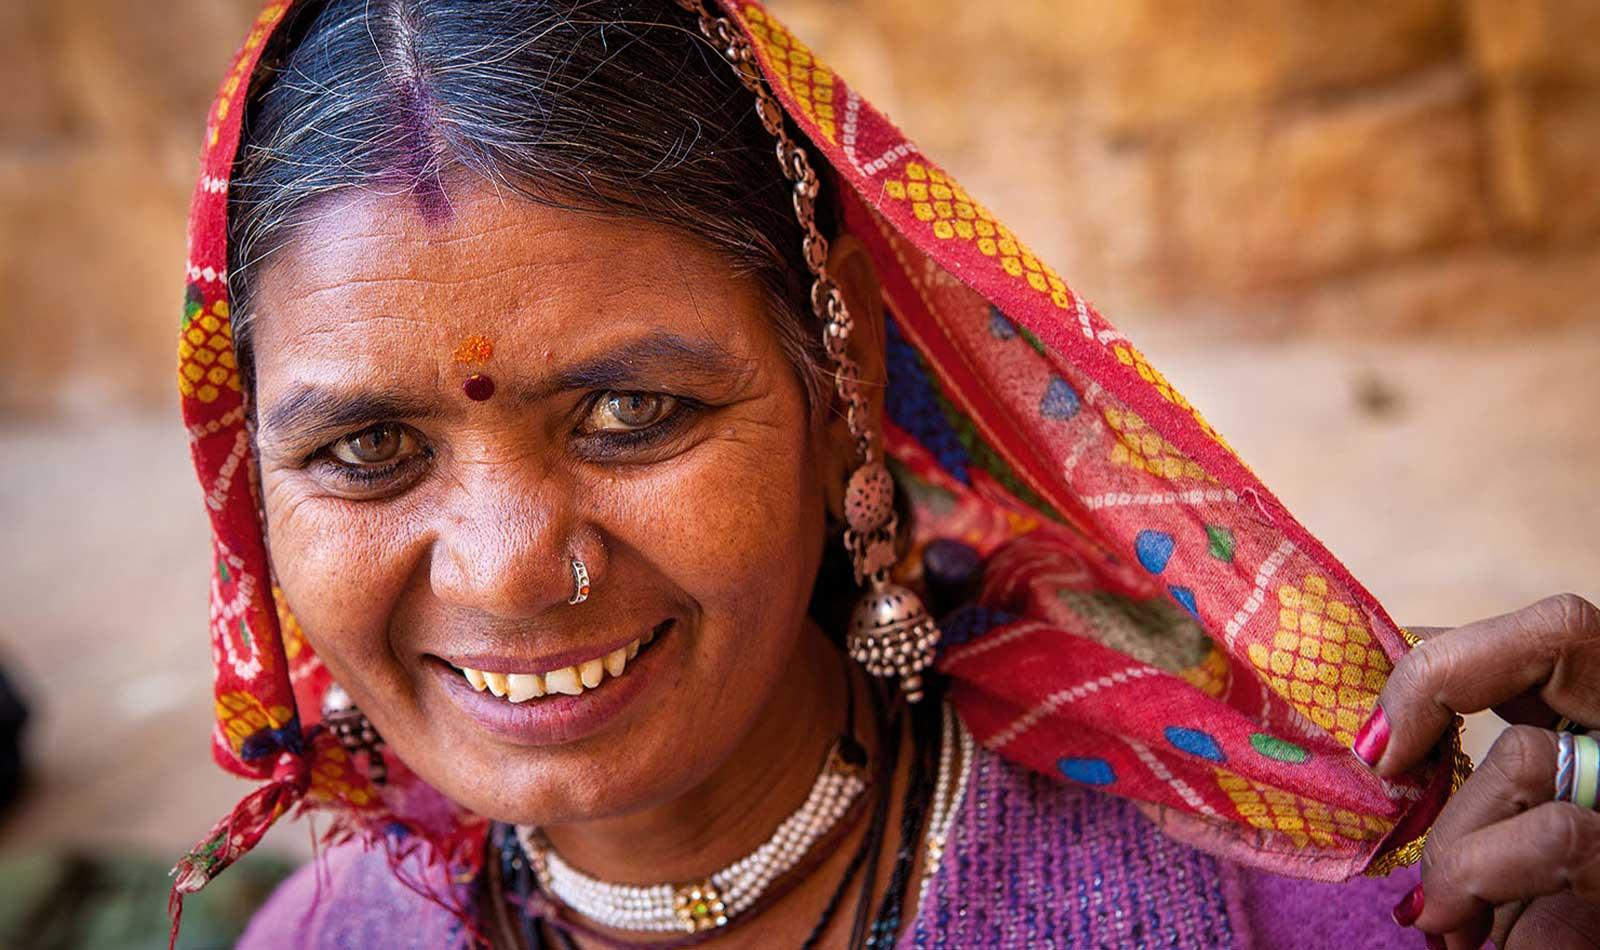 Rajasthan-Woman-01.jpg